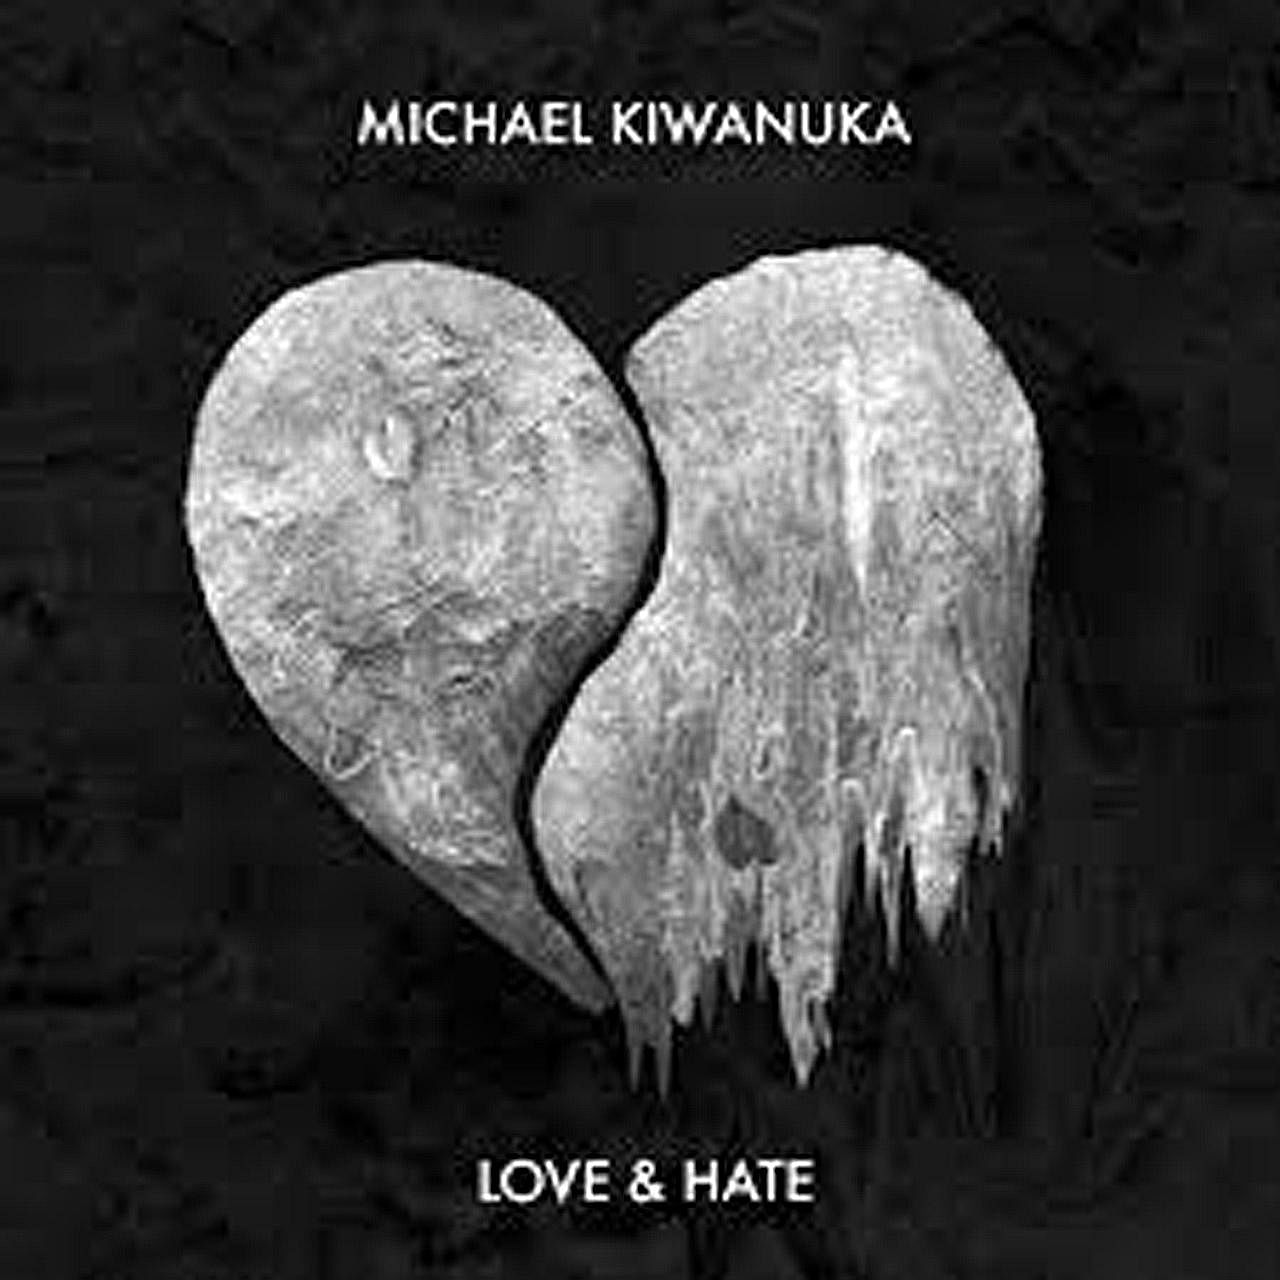 Michael Kiwanuka grew up on Britpop before delving deeper into soul, R&B and folk.